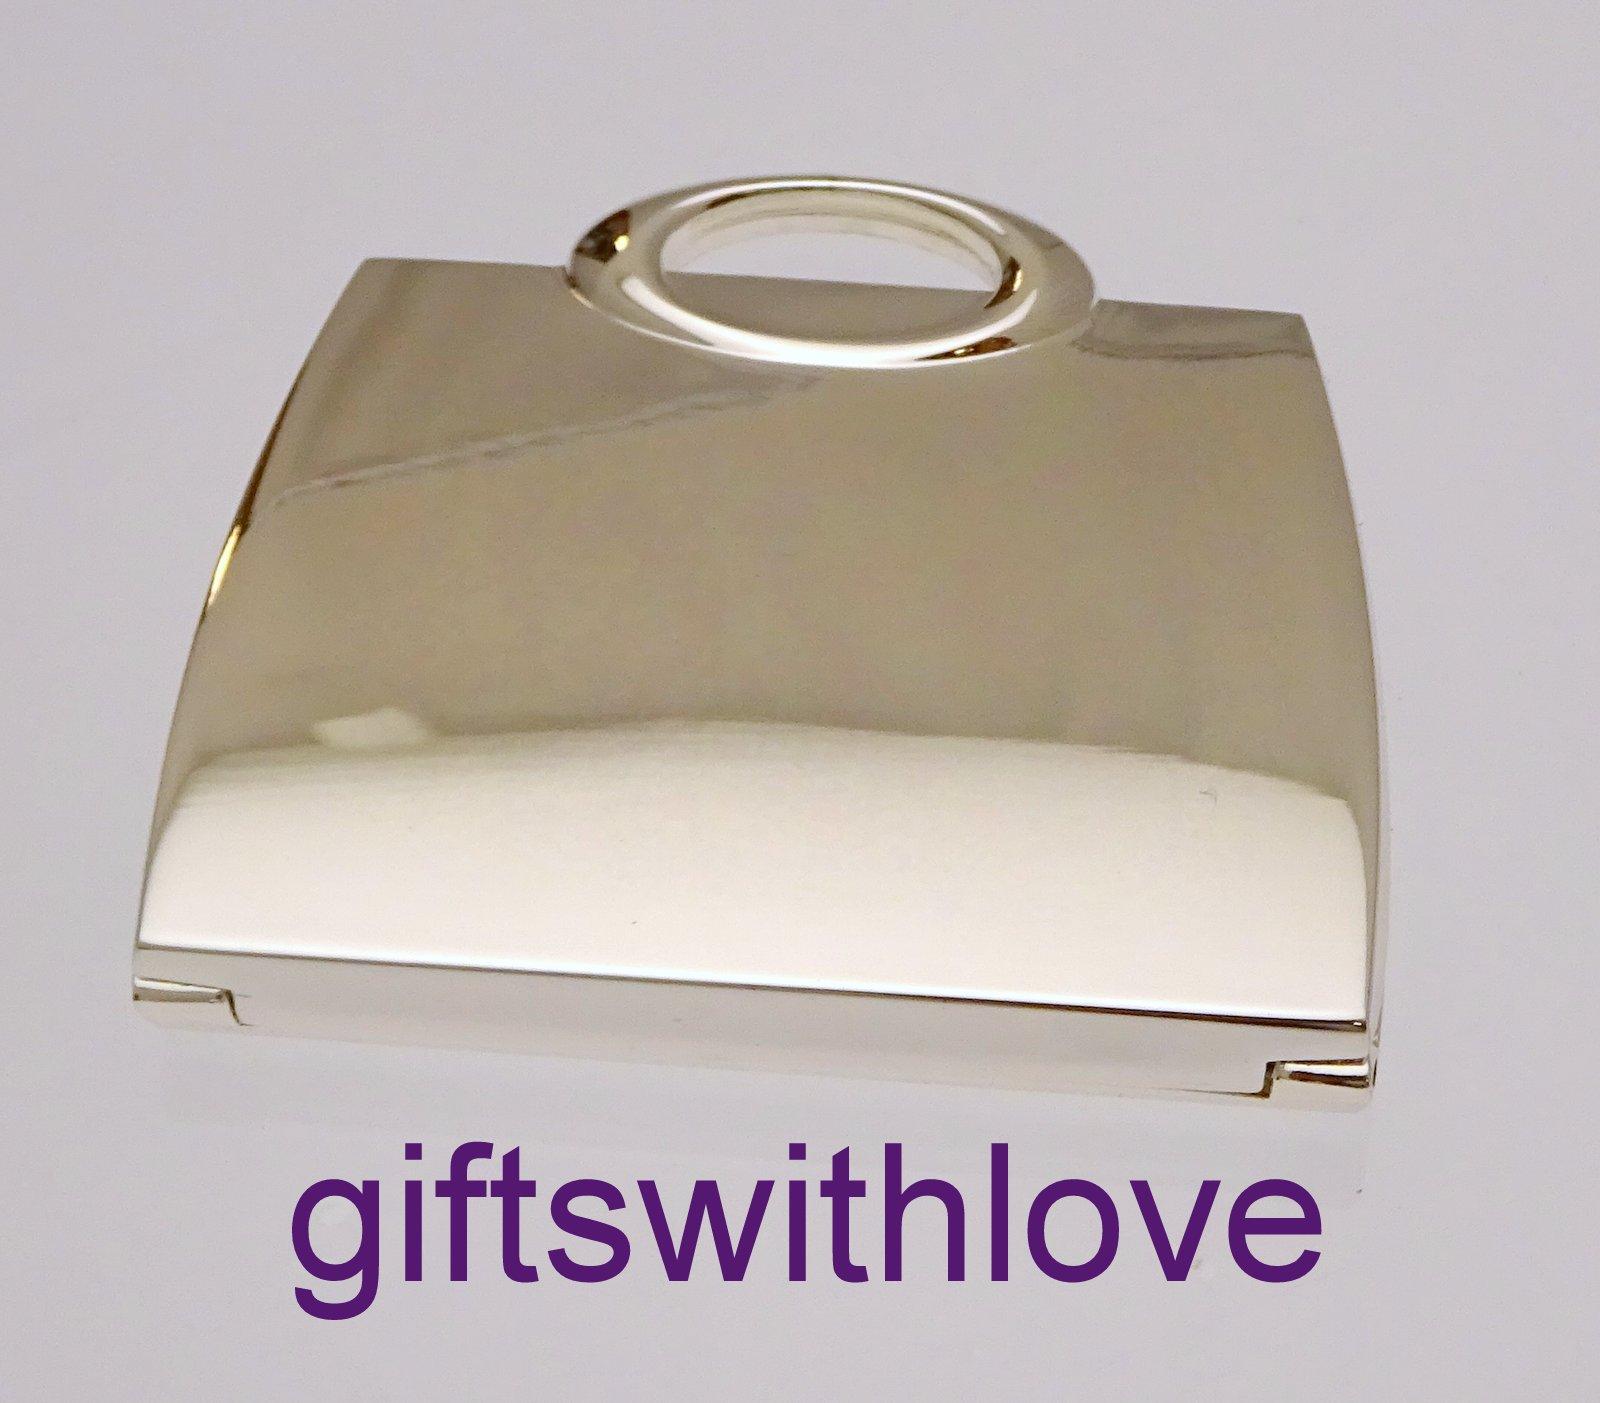 Handbag shaped Mirror Compact - FREE ENGRAVING